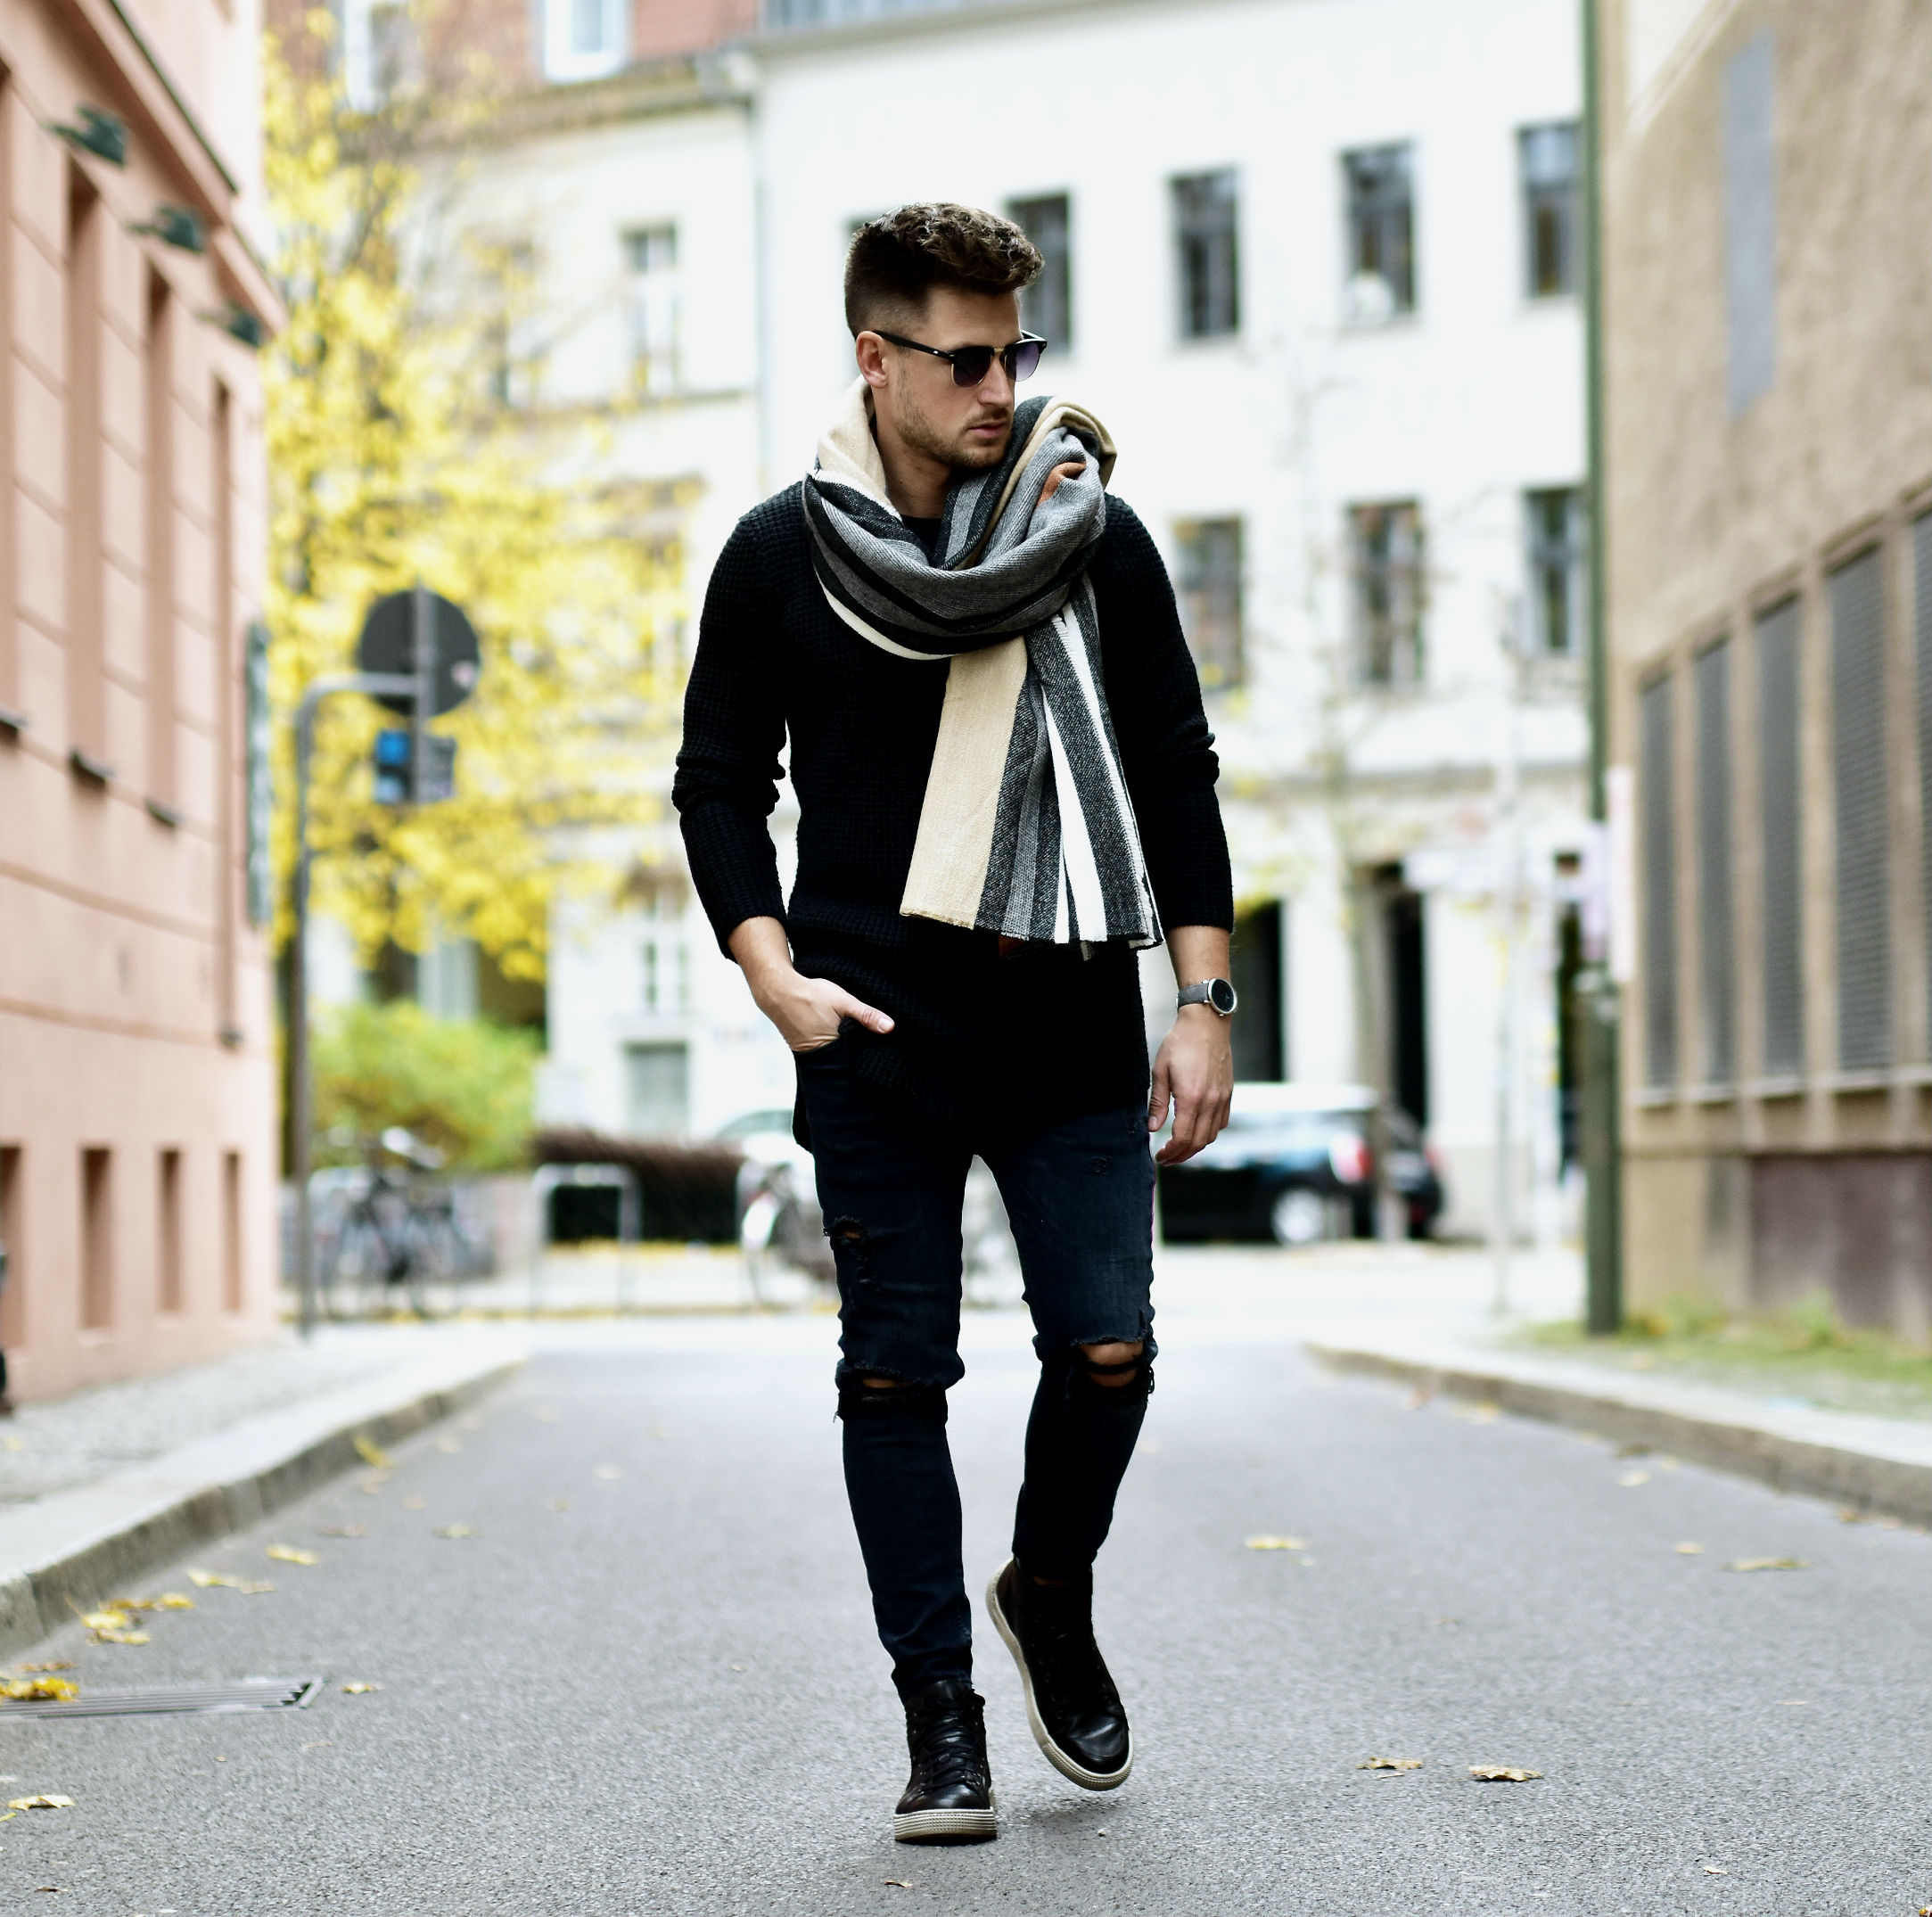 tommeezjerry-styleblog-maennerblog-maenner-modeblog-berlin-berlinblog-maennermodeblog-outfit-mantel-camel-active-coat-high-sneaker-autumn-look-streetlook